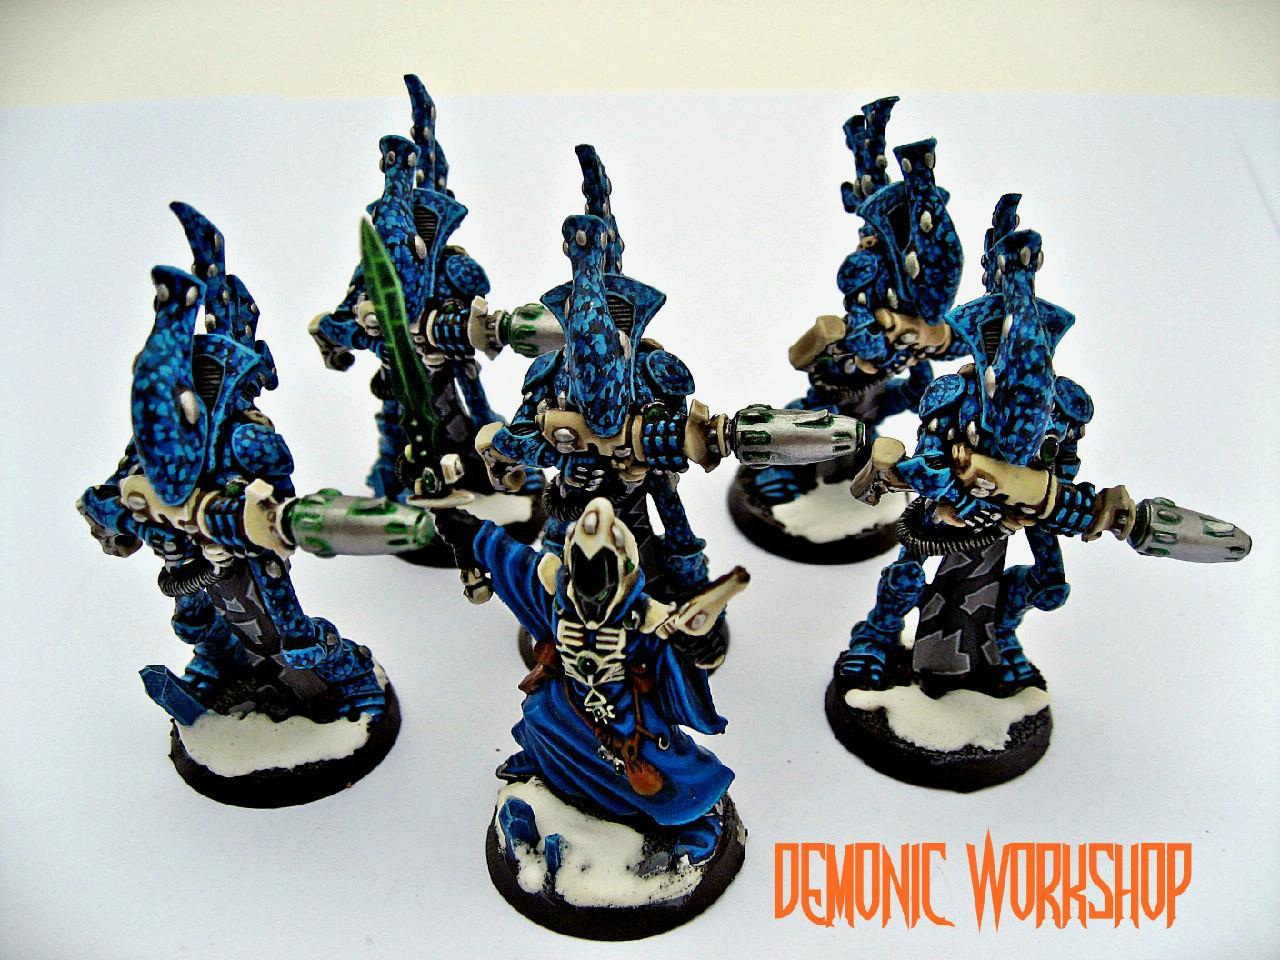 Demonic Workshop, Eldar, Snow, Warhammer 40,000, Warlock, Wraithguard